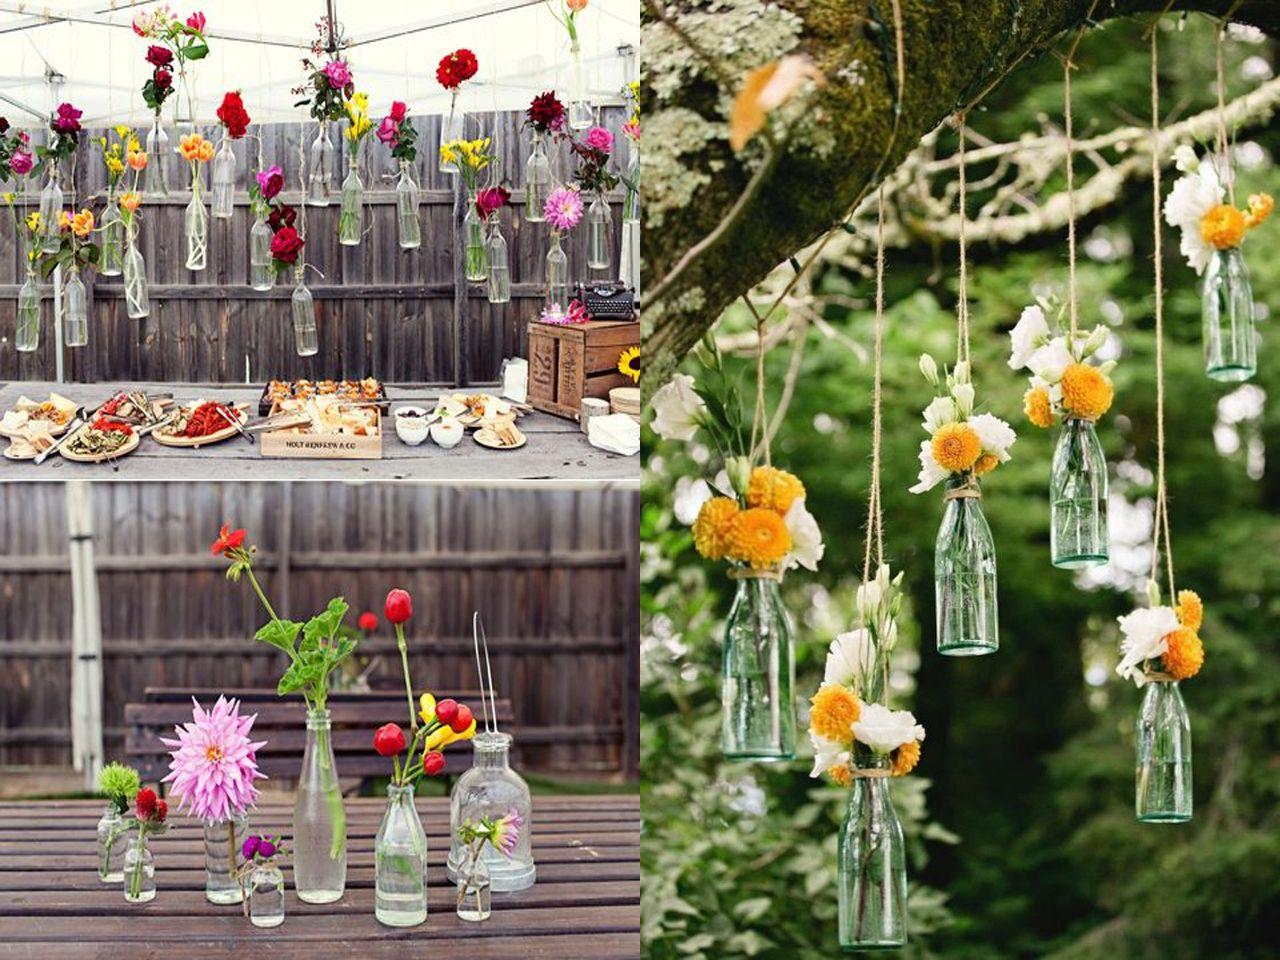 7 ideas de decoraci n jardines para fiestas ideas para - Decoracion en jardines ...